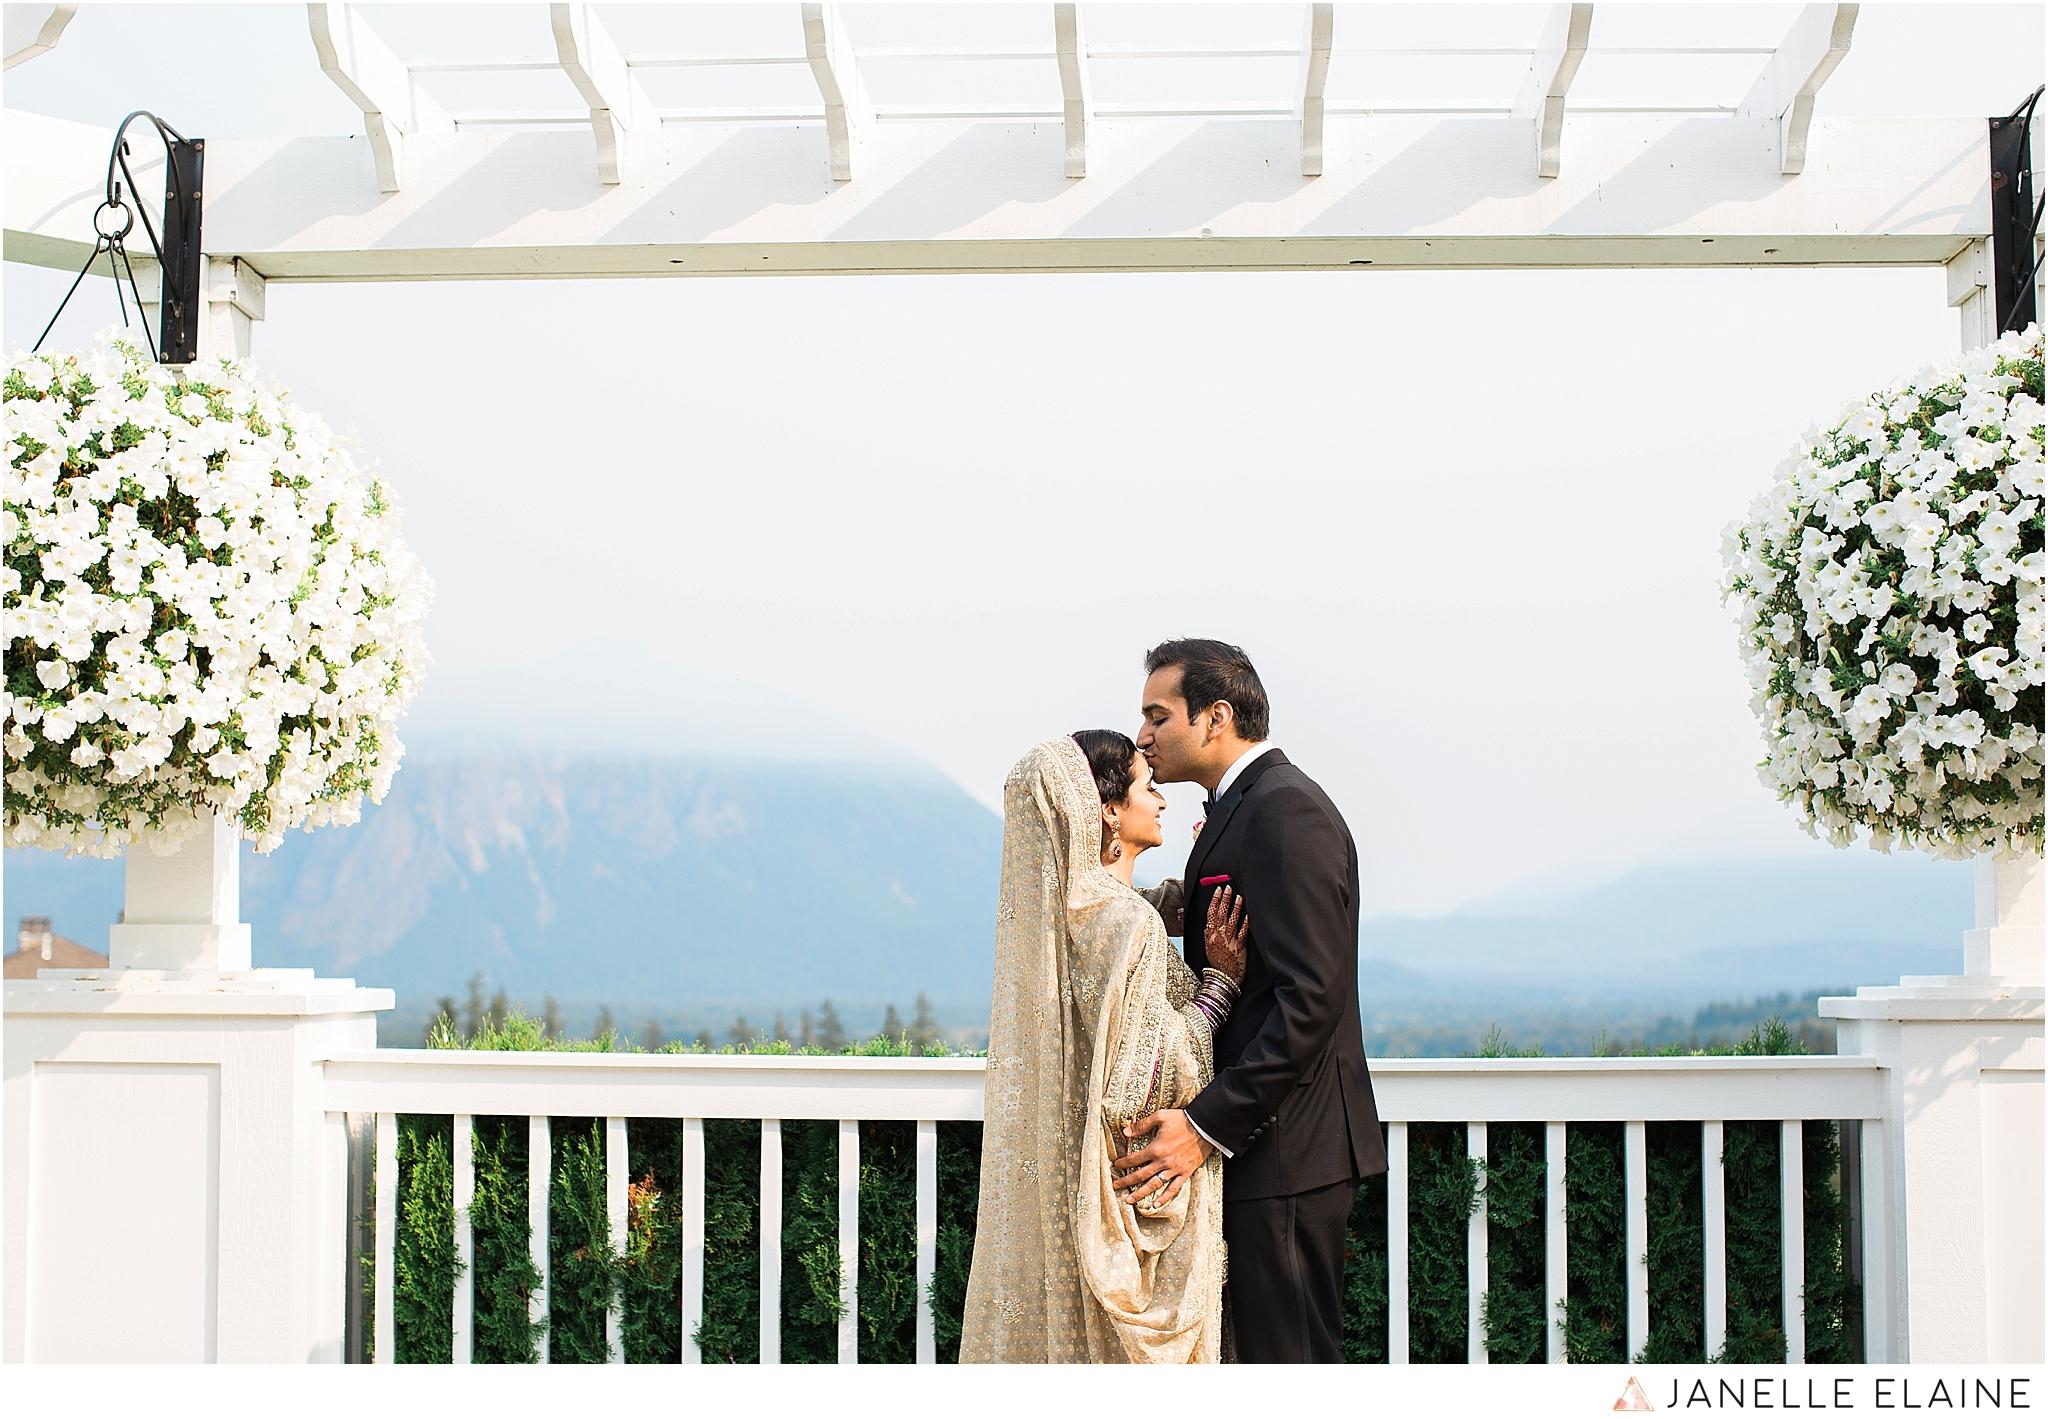 janelle elaine photography-the club at snoqualmie ridge-washington-wedding-photography-portraits-35.jpg